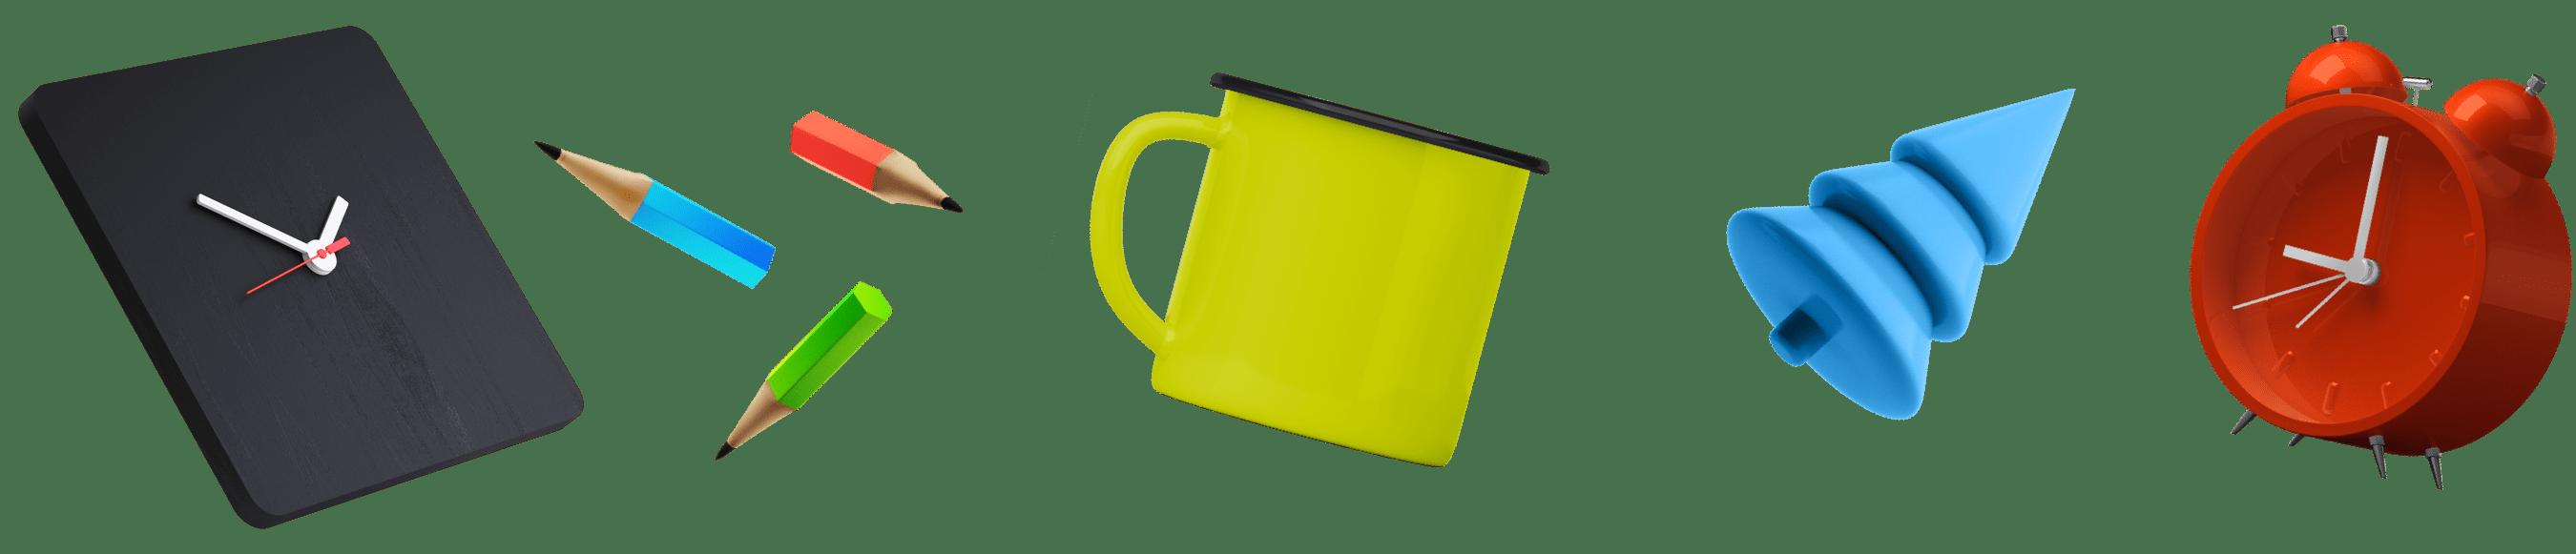 logitech_items2